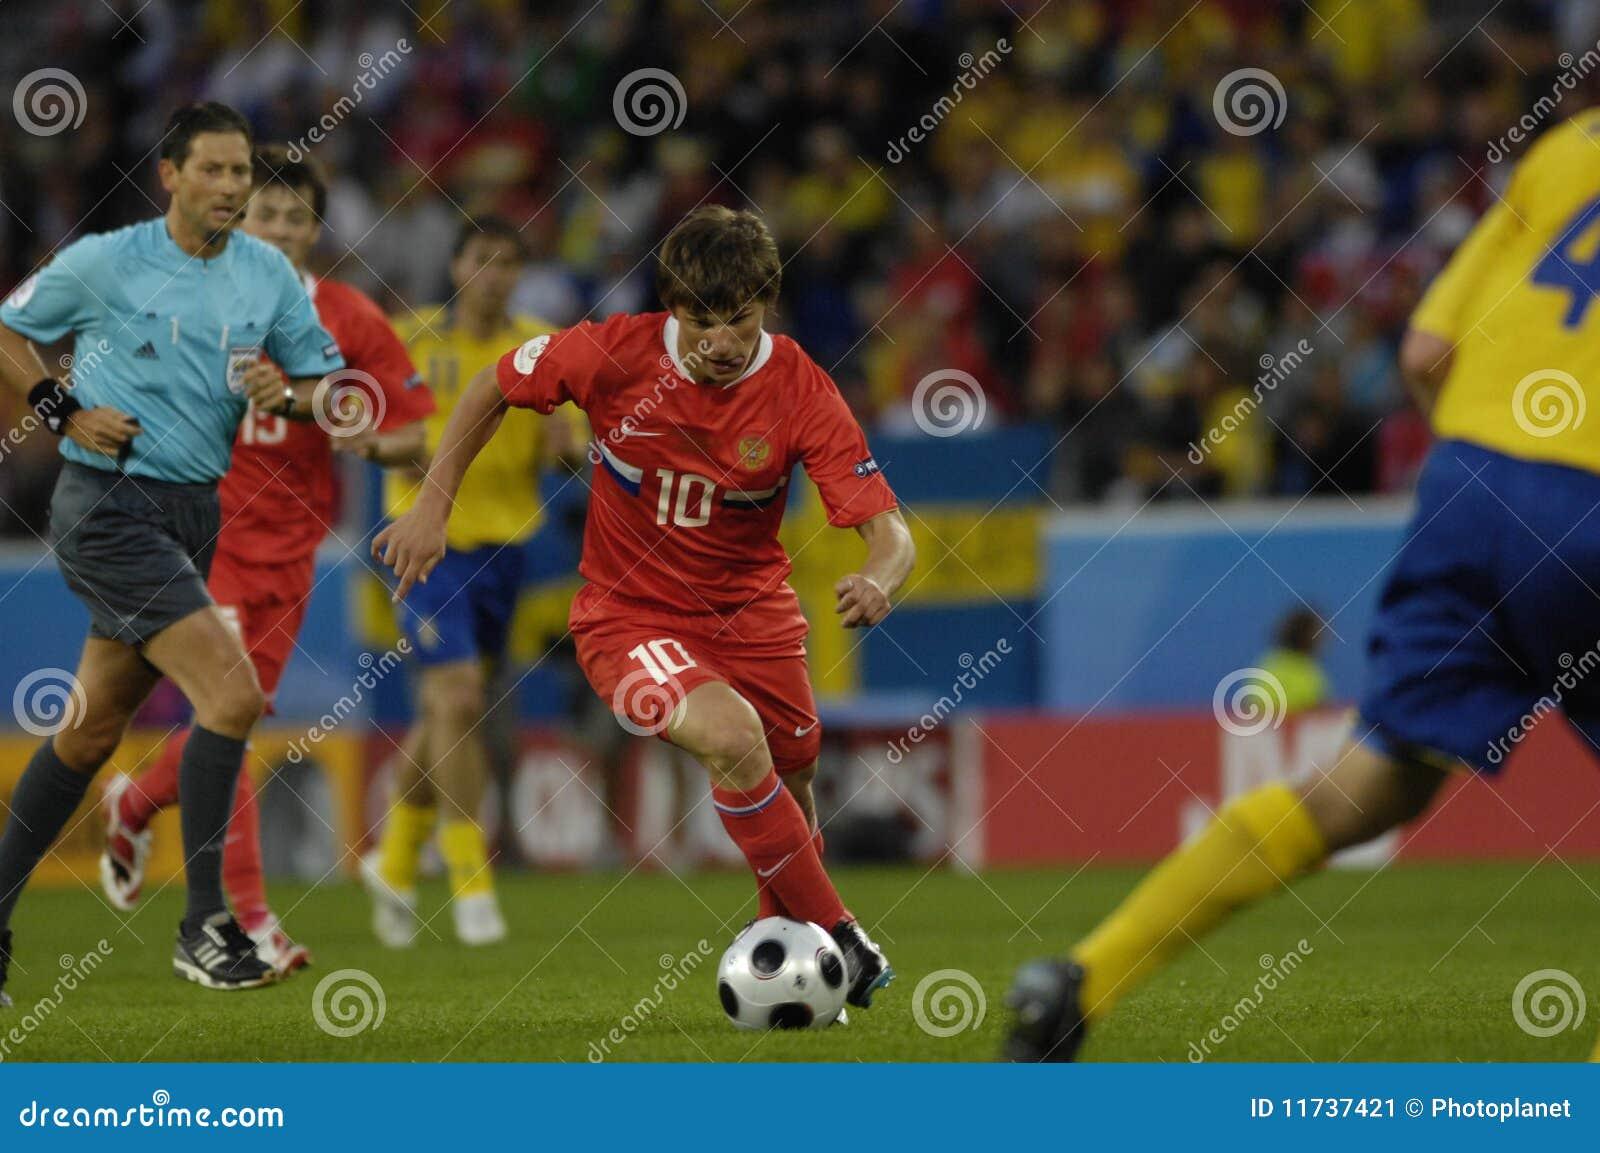 FranceFootball 2009 i migliori 30Players Andrei Arshavin